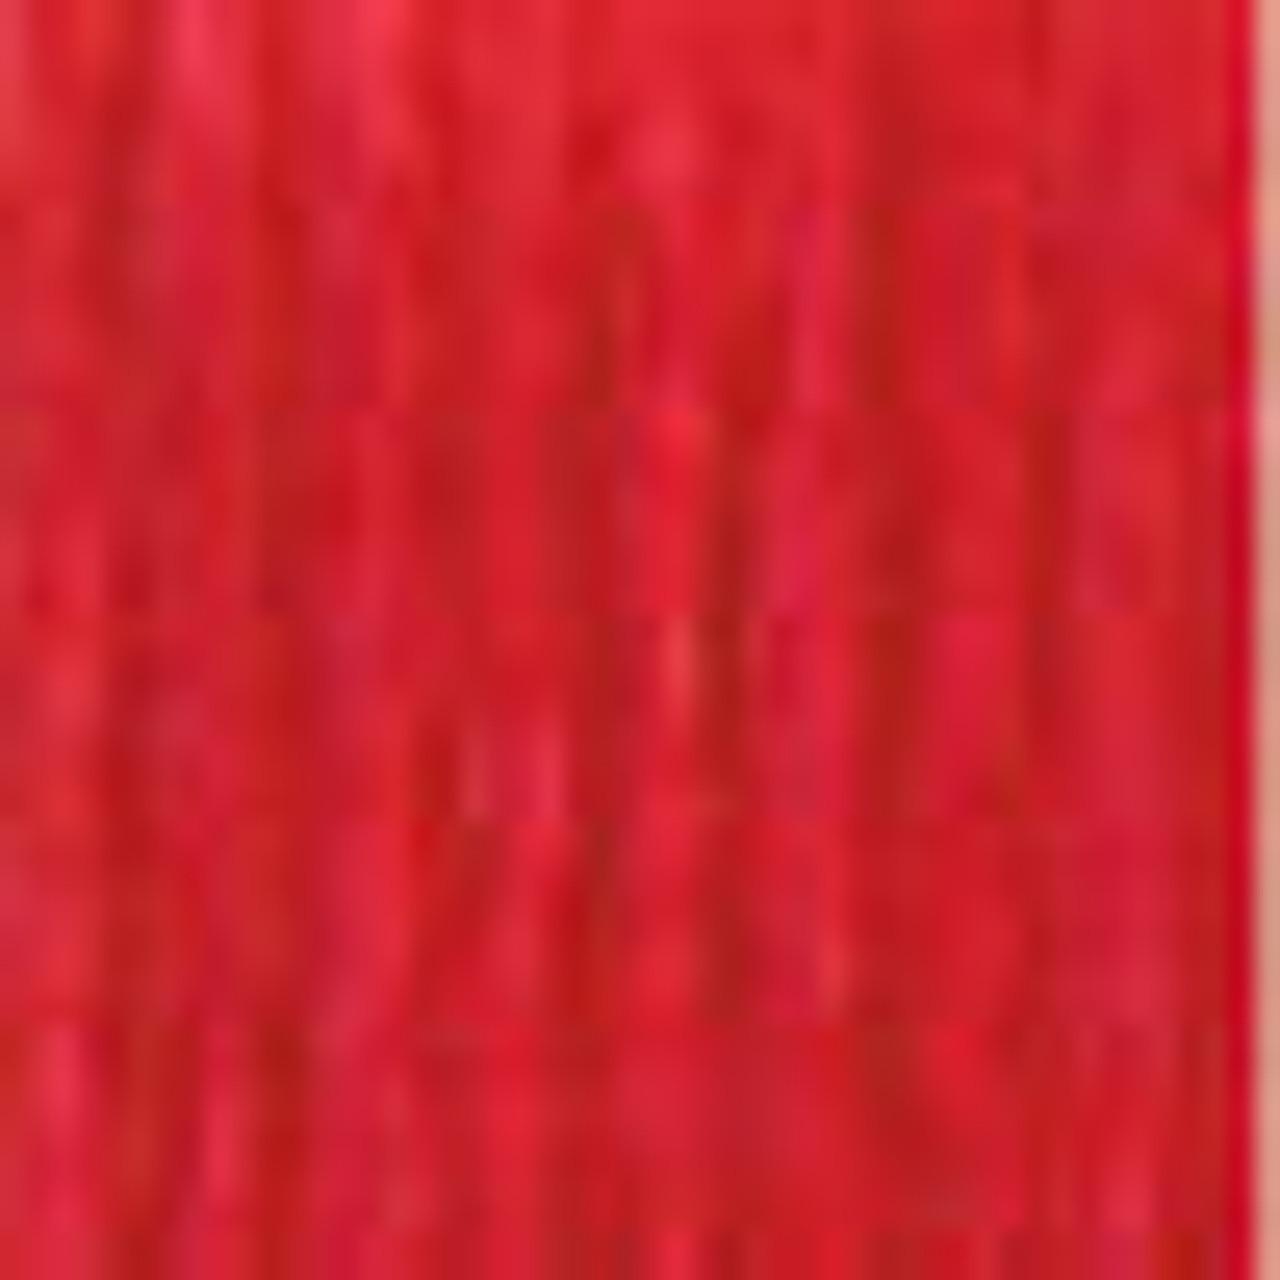 Dmc 150 Ultra Very Dk Dusty Rose Floss Thread Crossstitchworld